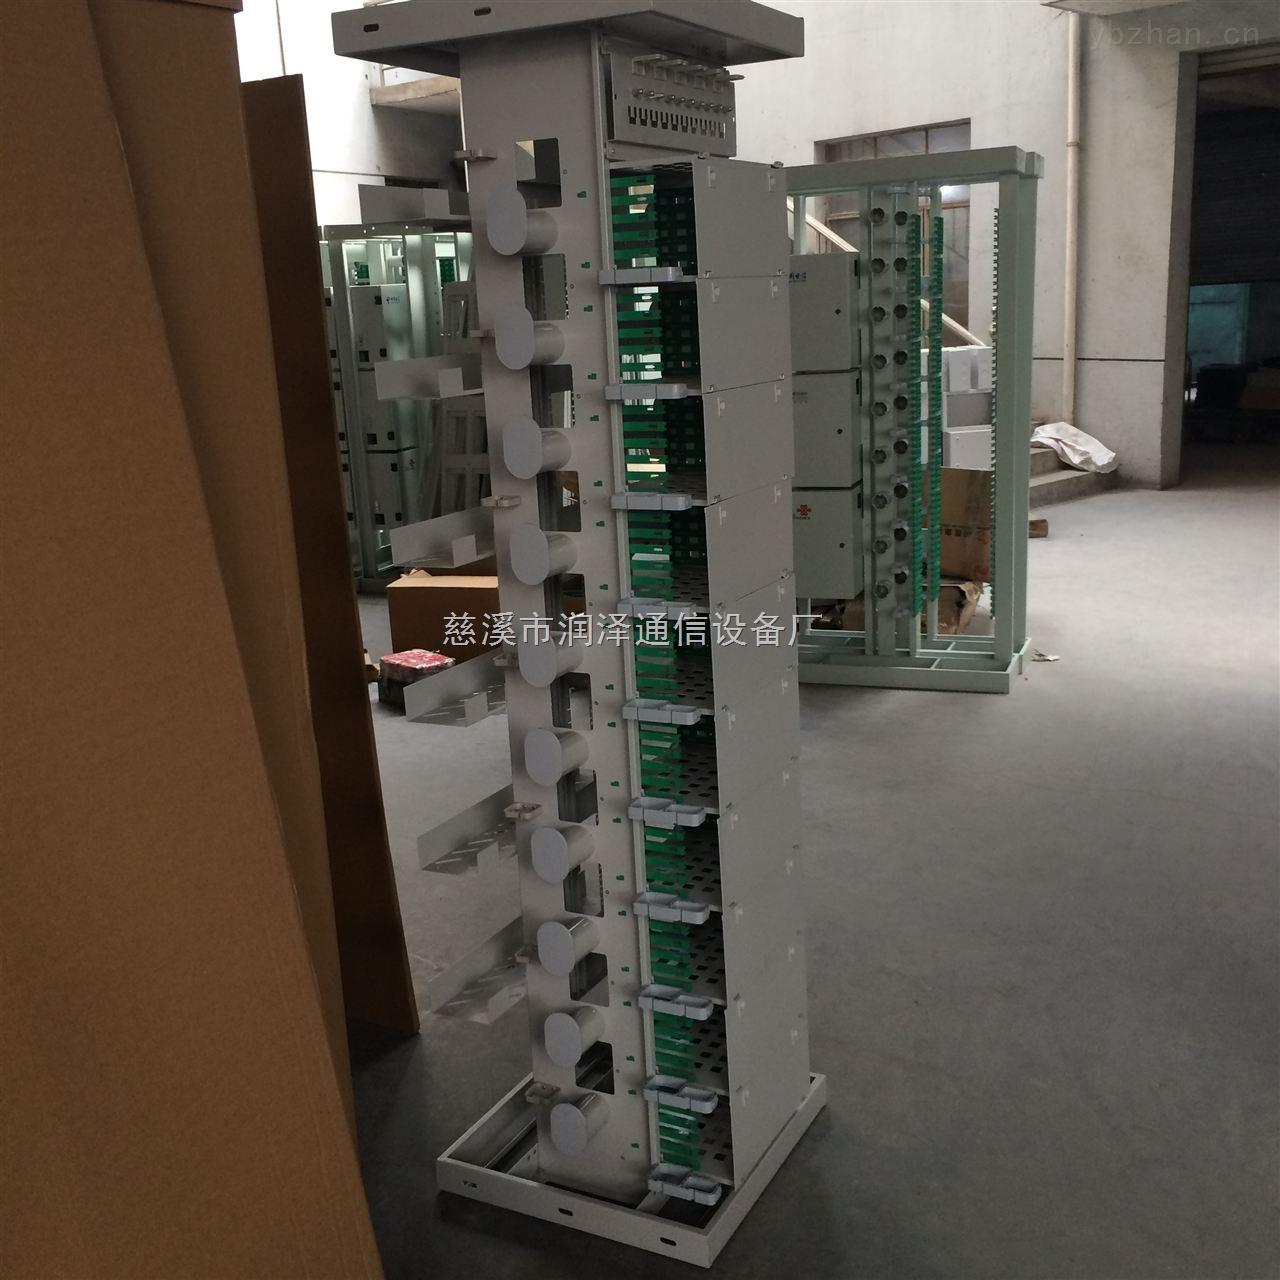 omdf光纤总配线架(润泽通信设备厂)